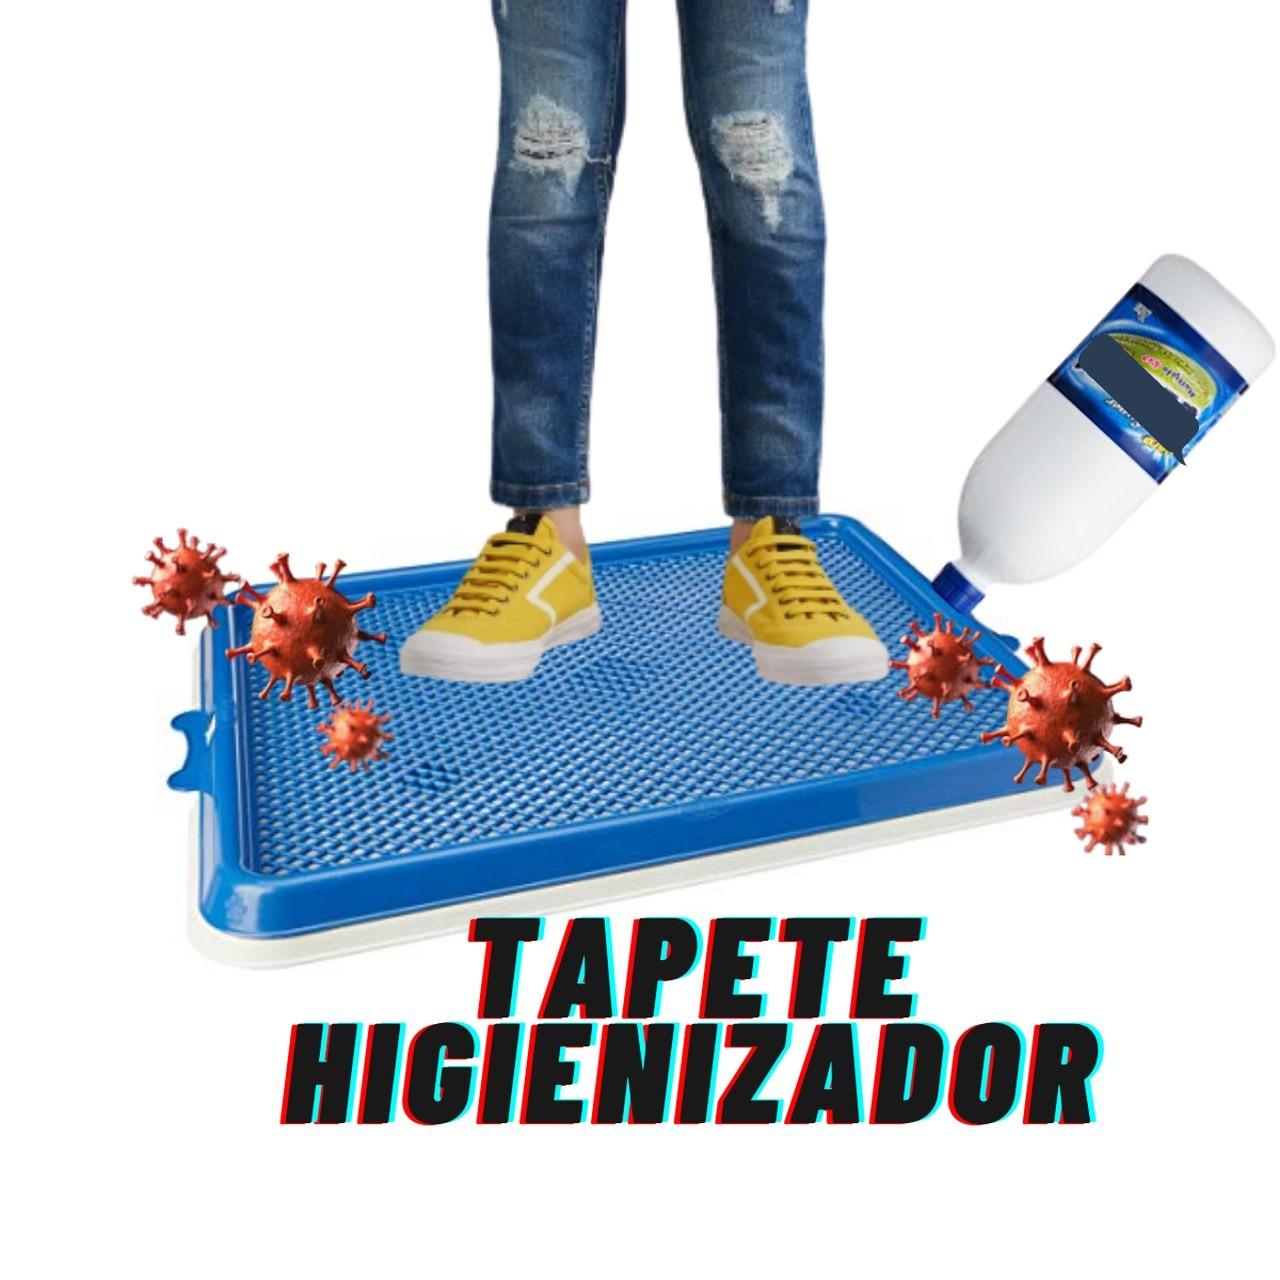 Tapete Higienizador